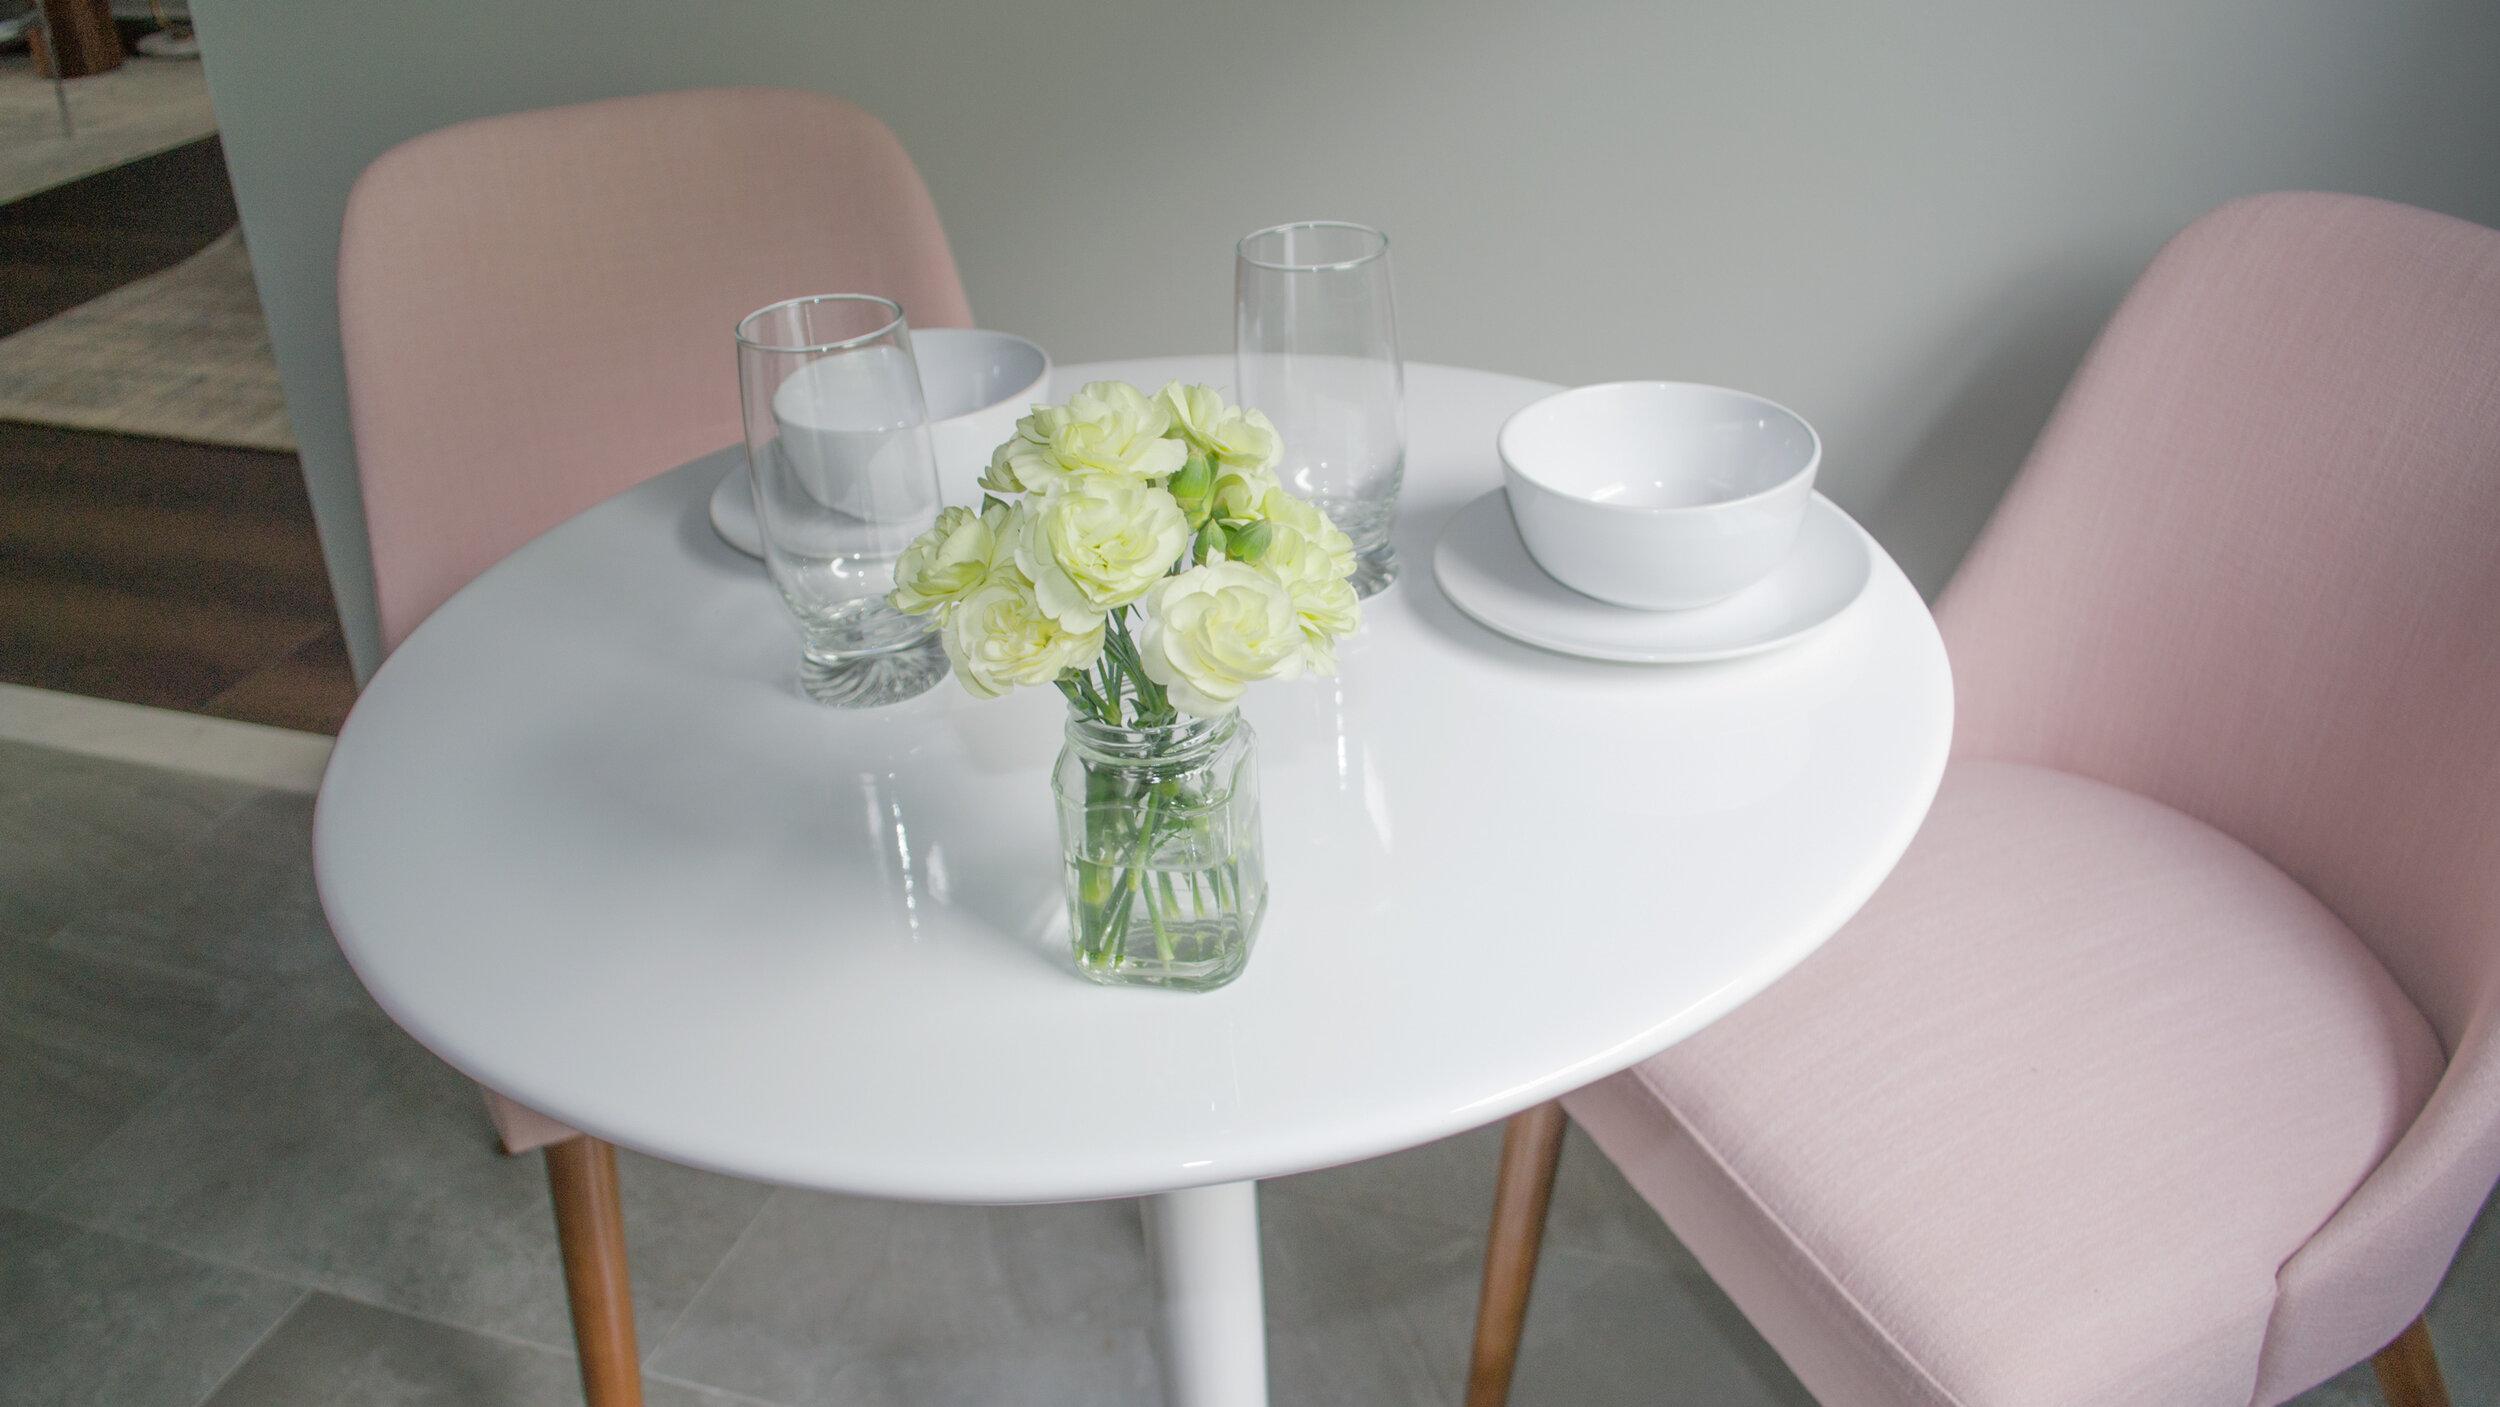 kitchenette-pink-tc-interiors-1.jpg